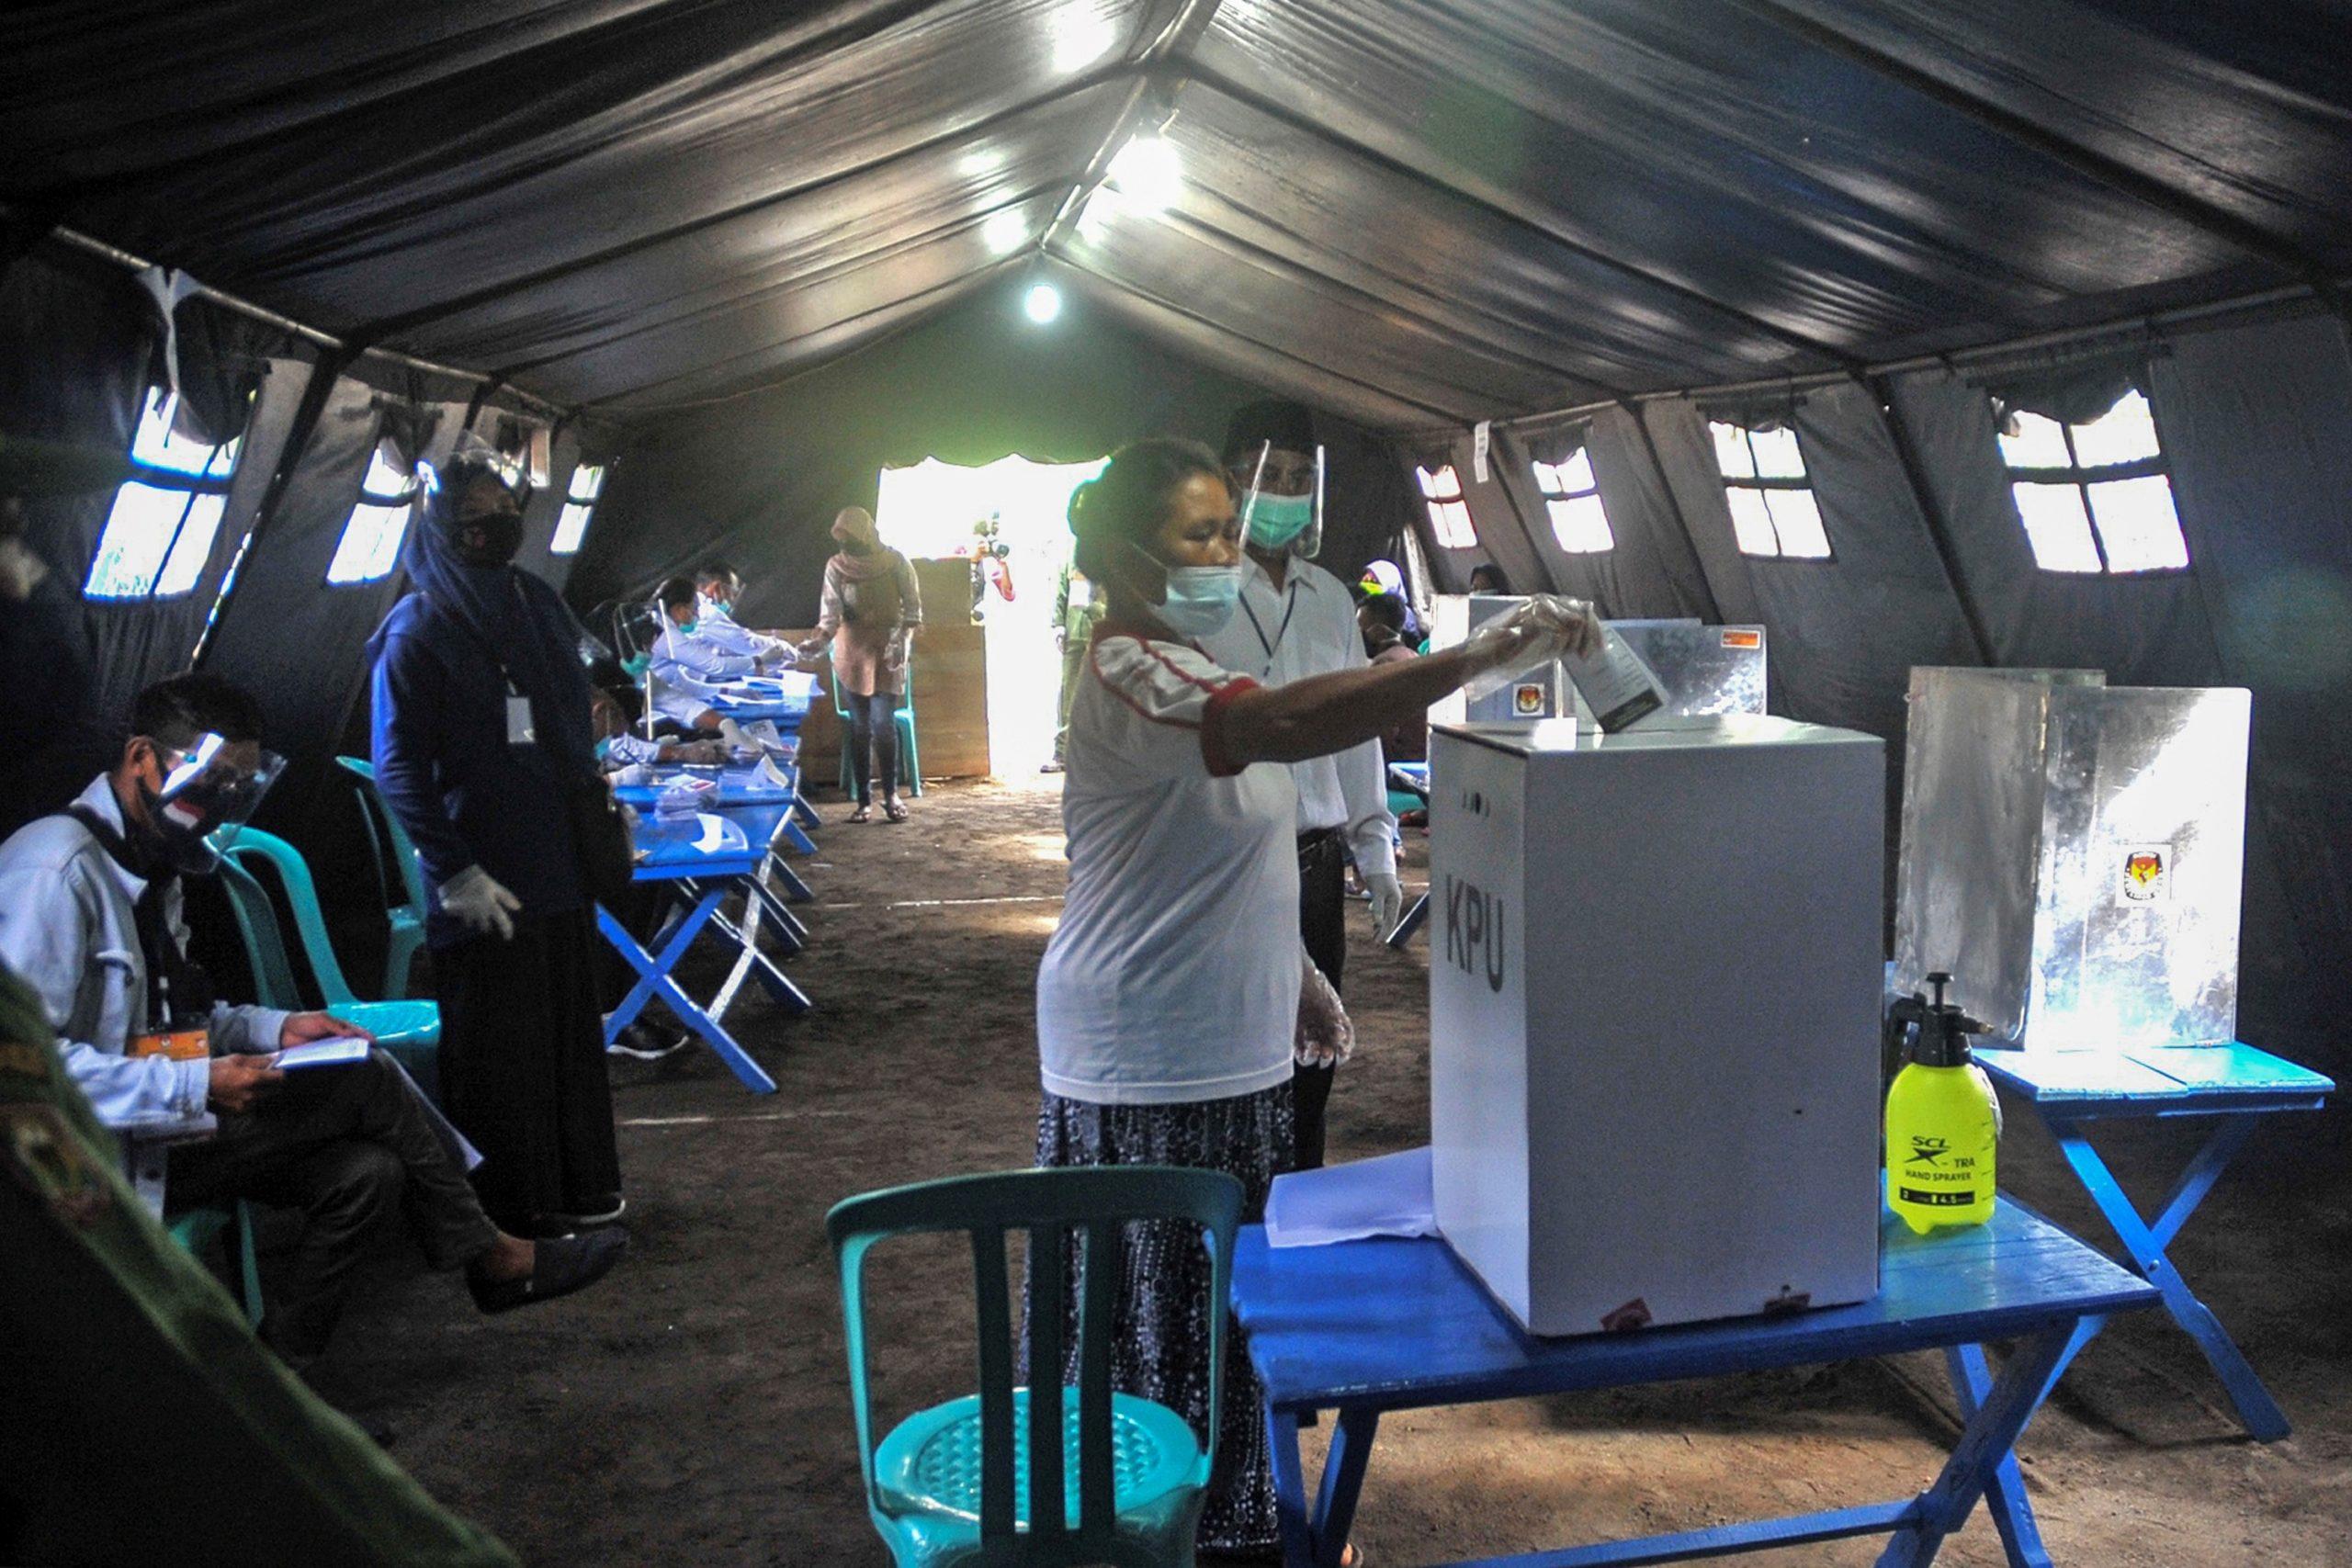 Indonesia holds nationwide poll despite virus warnings